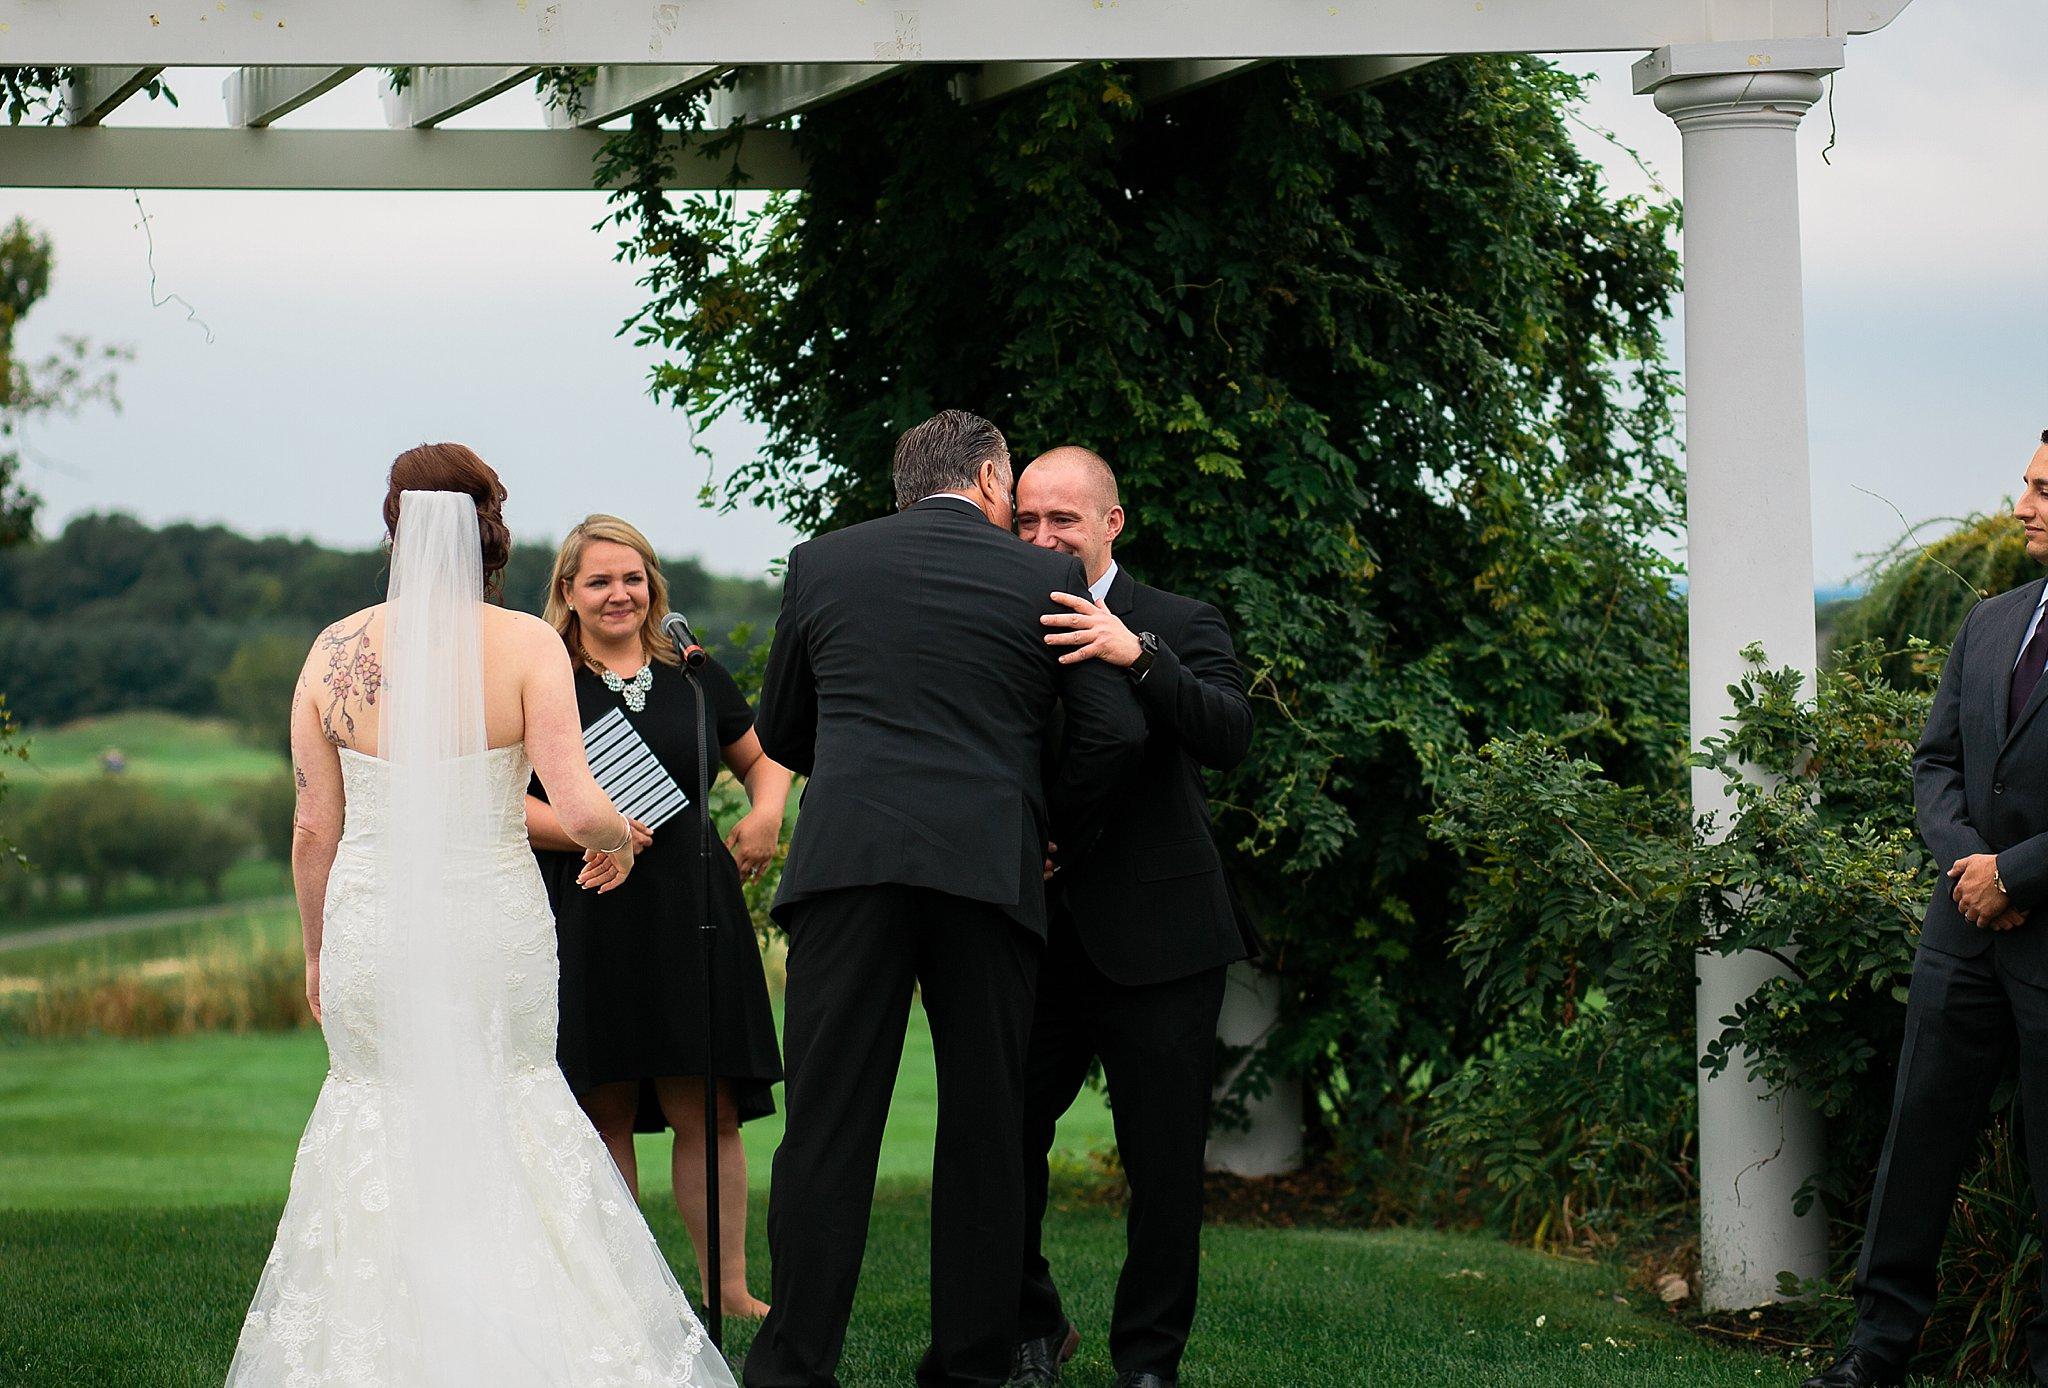 Links at Unionvale Wedding Lagrangeville Wedding Hudson Valley Wedding Photographer Sweet Alice Photography28.jpg